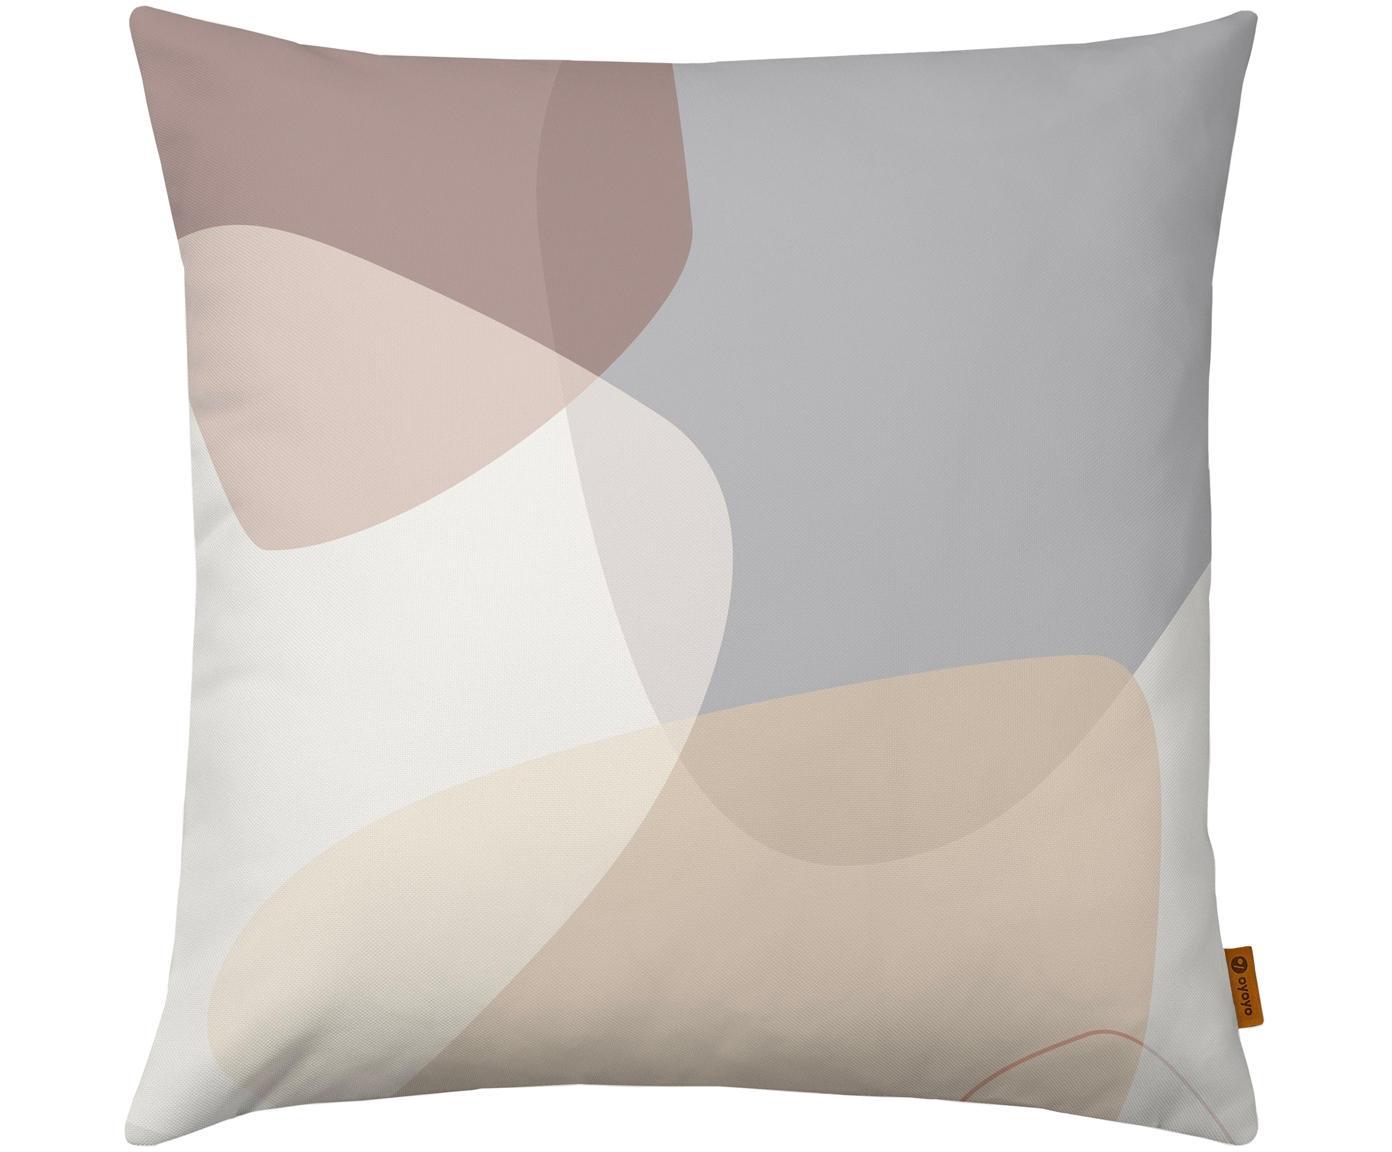 Kissenhülle Graphic mit geometrischem Print, 100% Polyester, Beige, Grau, Creme, Altrosa, 50 x 50 cm